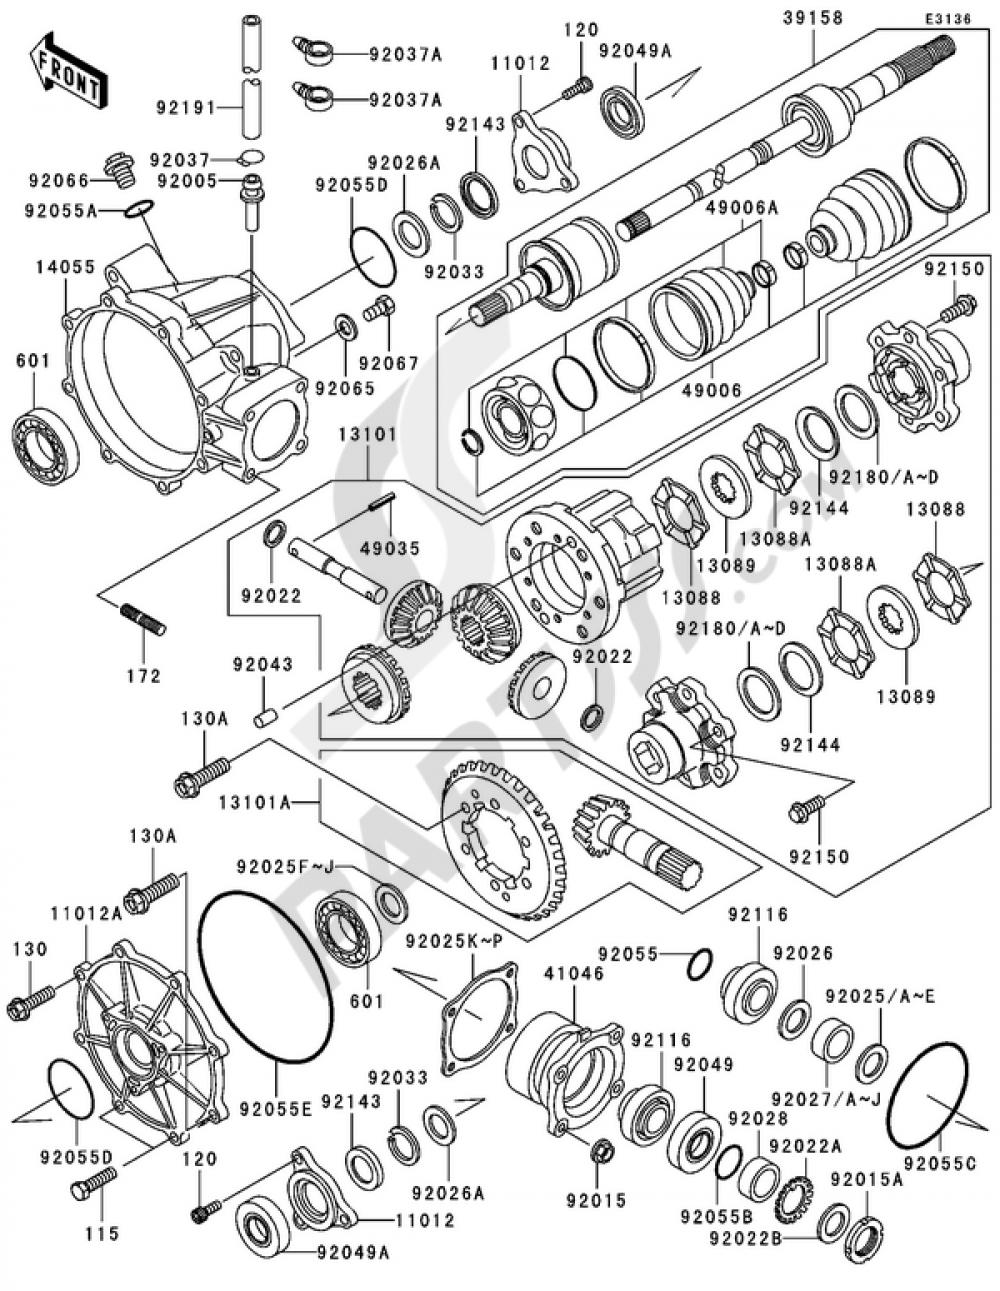 drive shaft front 1 3 kawasaki mule 3010 4x4 2004 Kawasaki Mule 3010 4x4 Parts